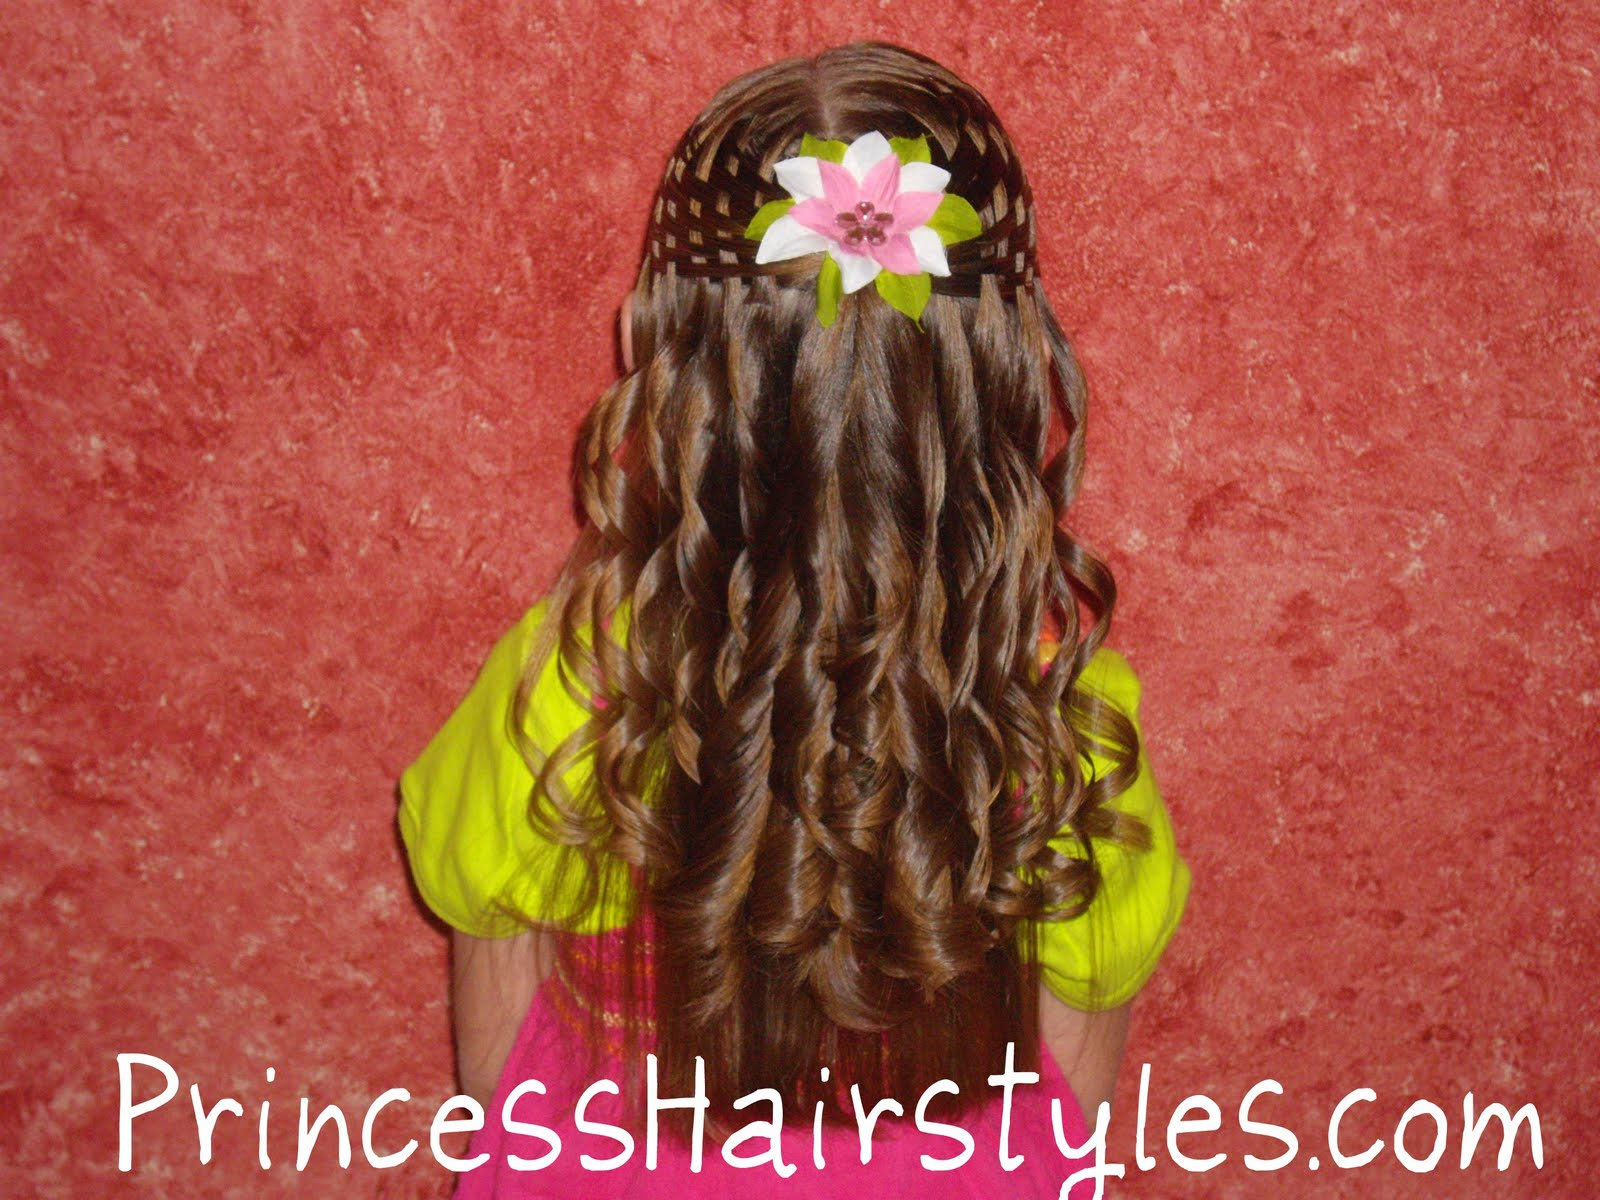 Stupendous Basket Weave Hairstyle Video Hairstyles For Girls Princess Short Hairstyles Gunalazisus